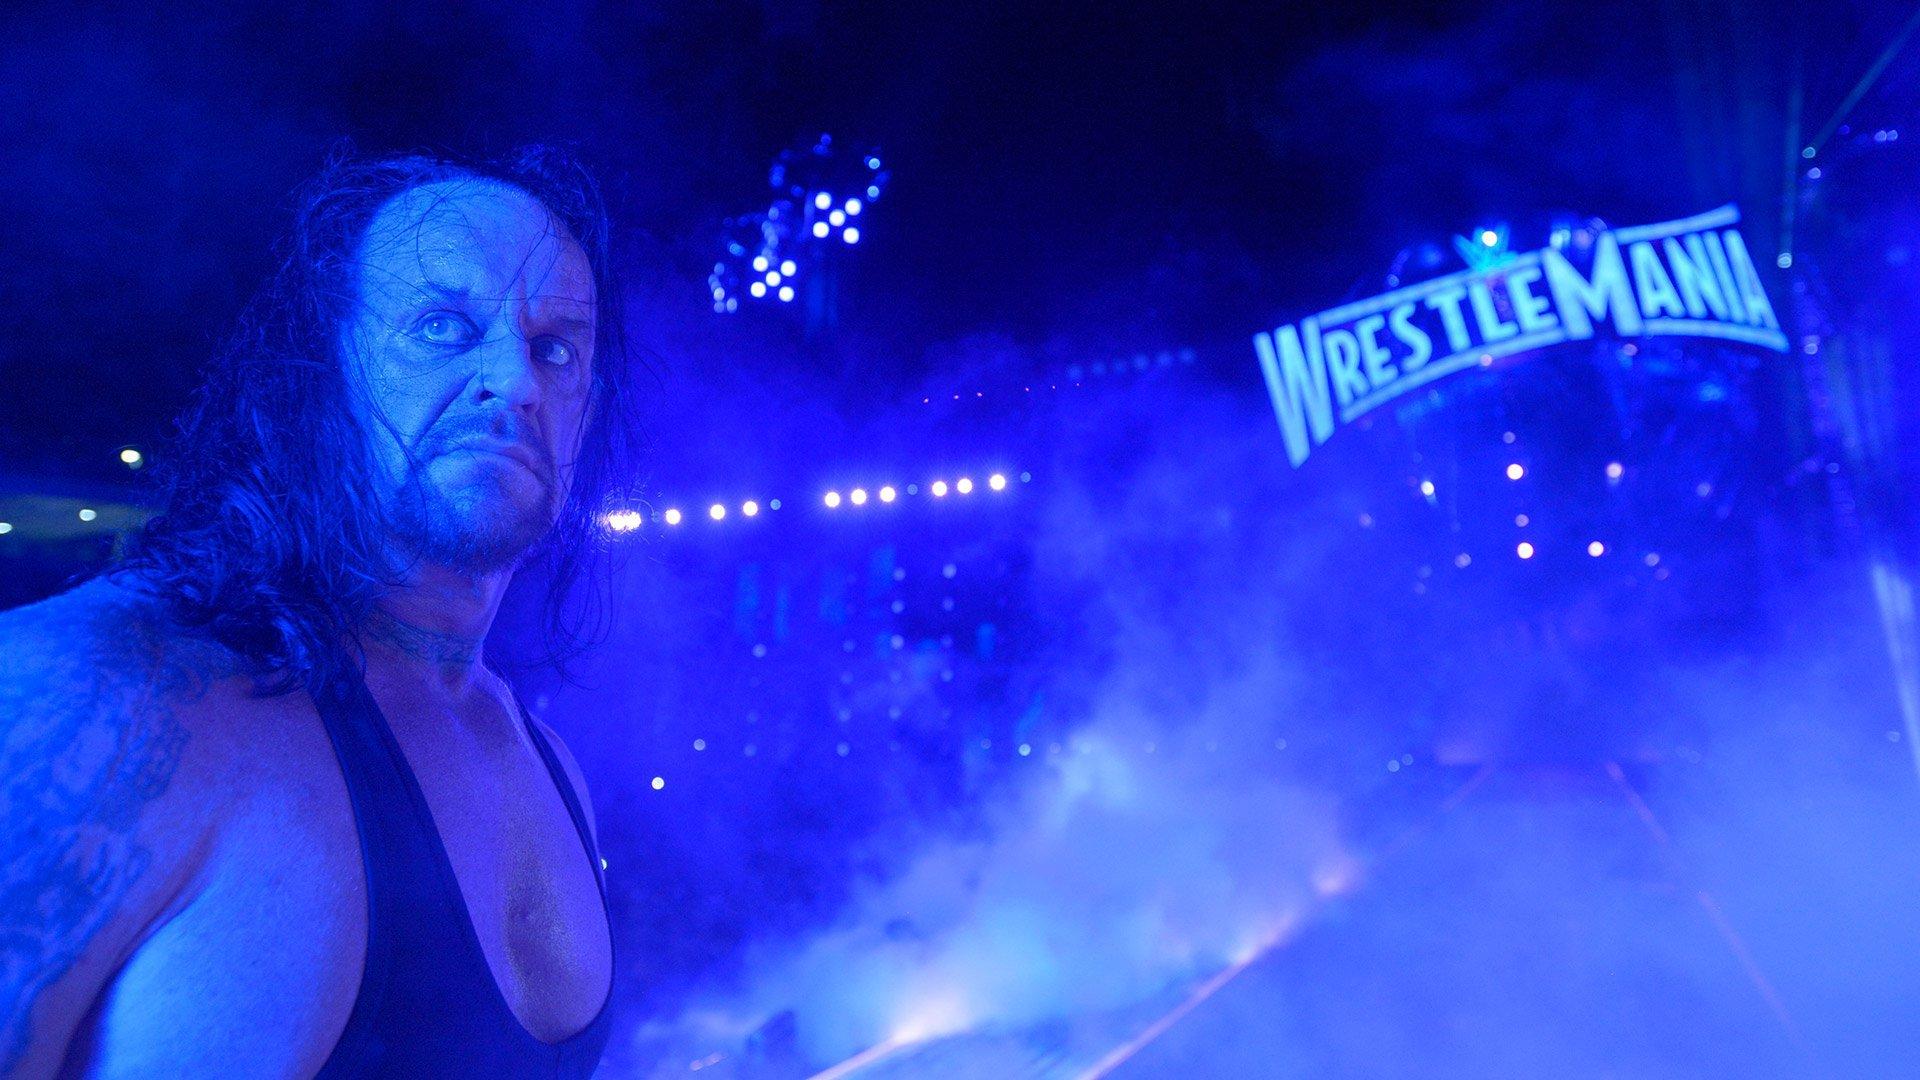 Recente foto de The Undertaker